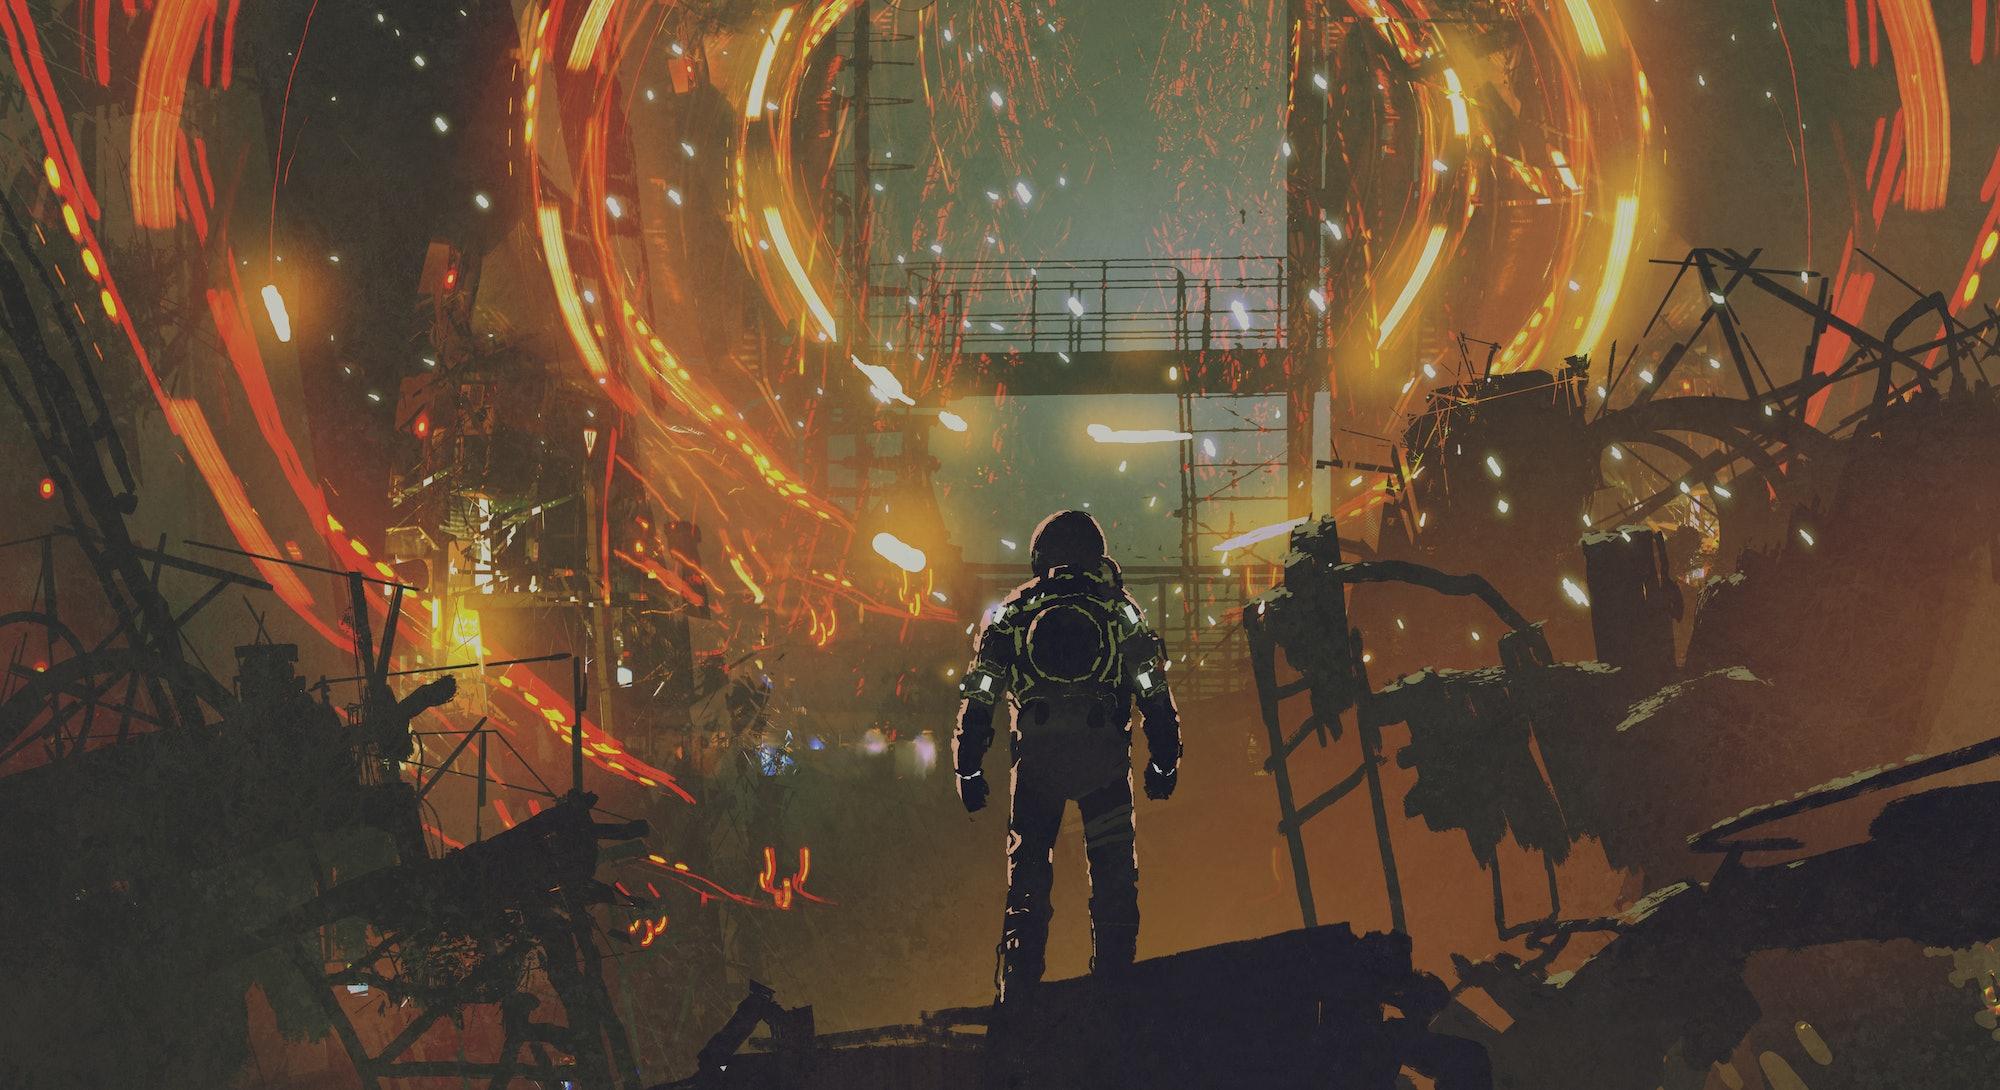 sci-fi scene of the astronaut looking at the futuristic portal, digital art style, illustration pain...